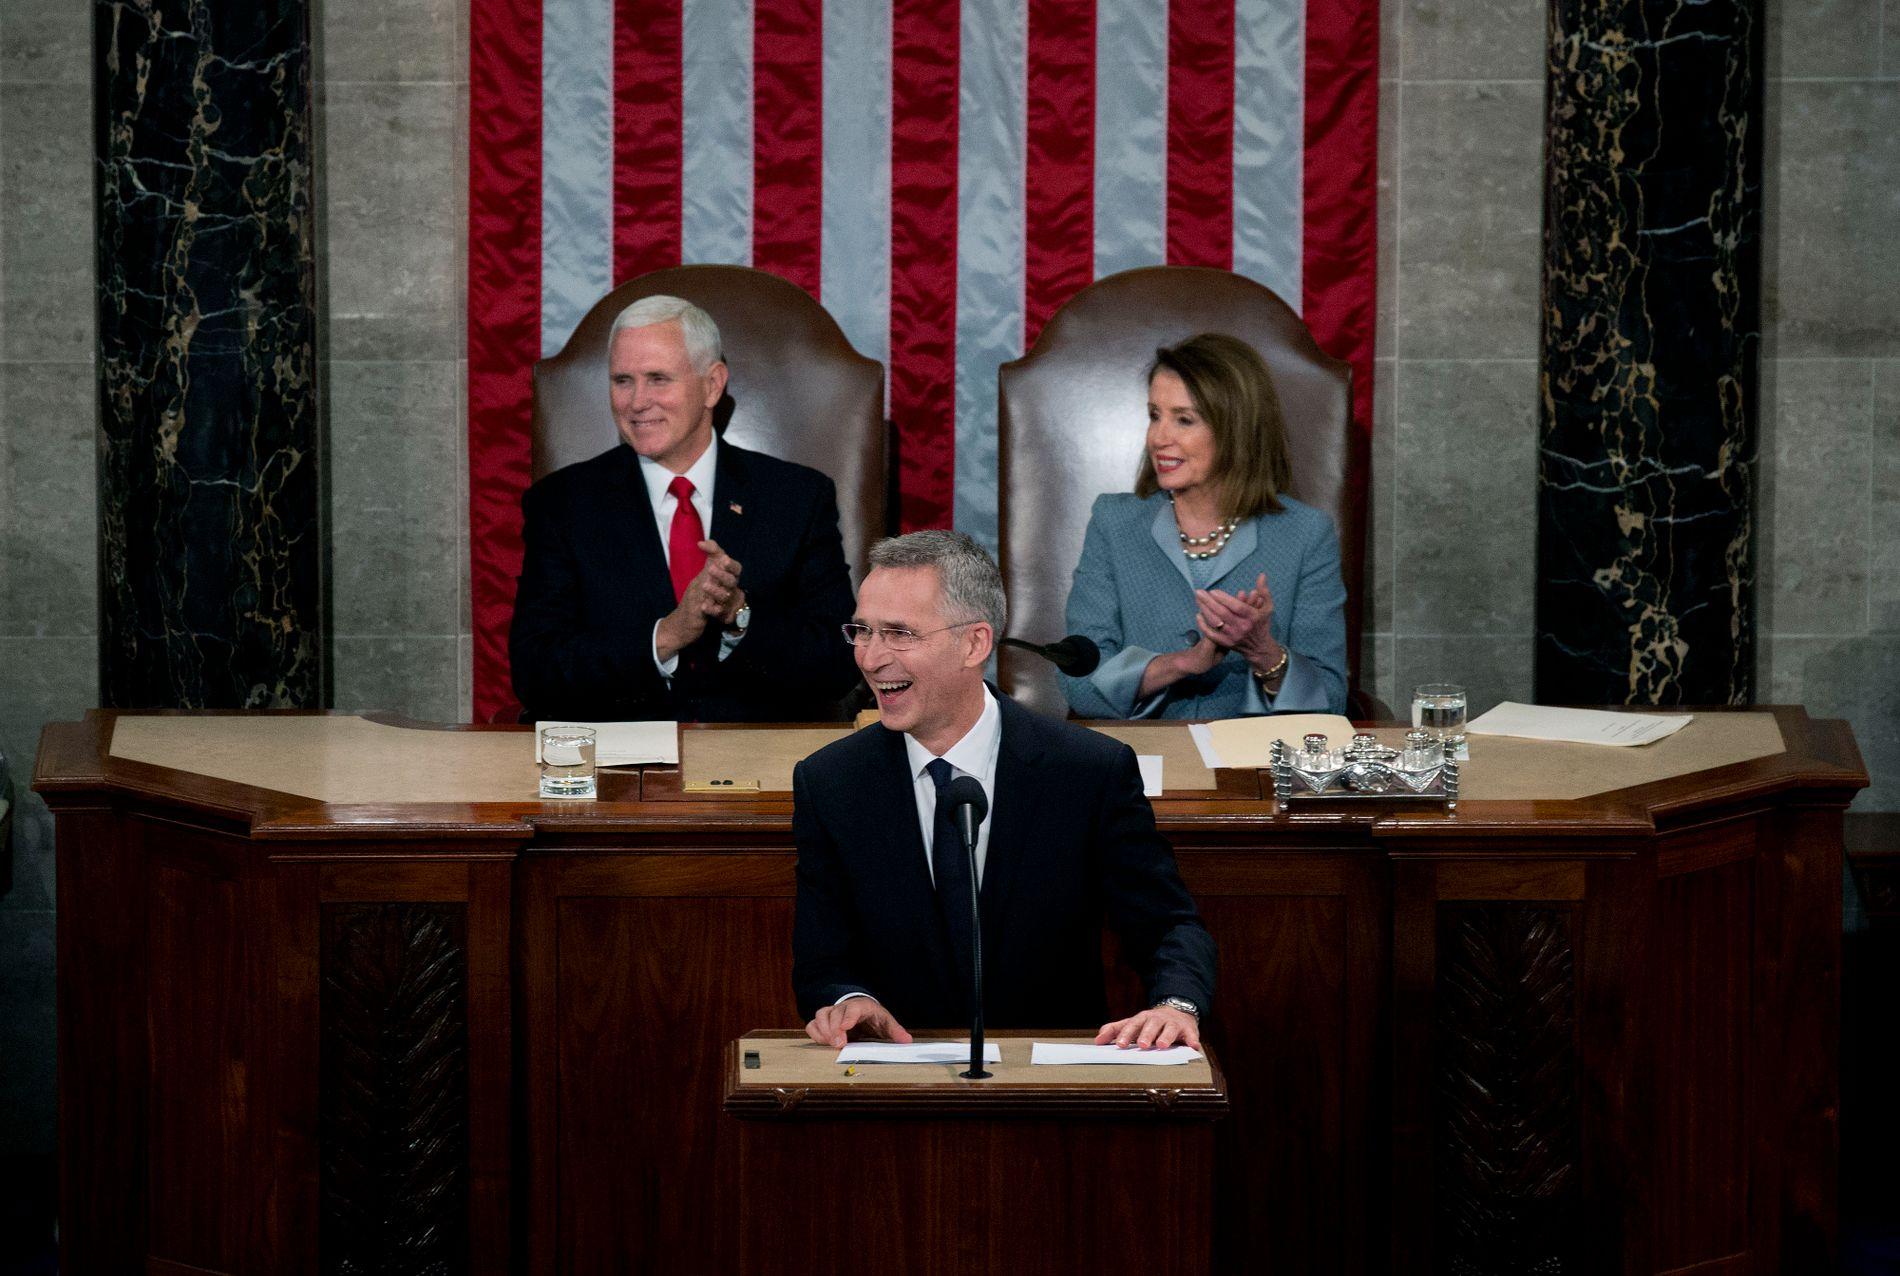 GOD STEMNING: Jens Stoltenberg fra talerstolen i USAs kongress med visepresident Mike Pence og Nancy Pelosi (D), som er leder i Representantenes Hus.